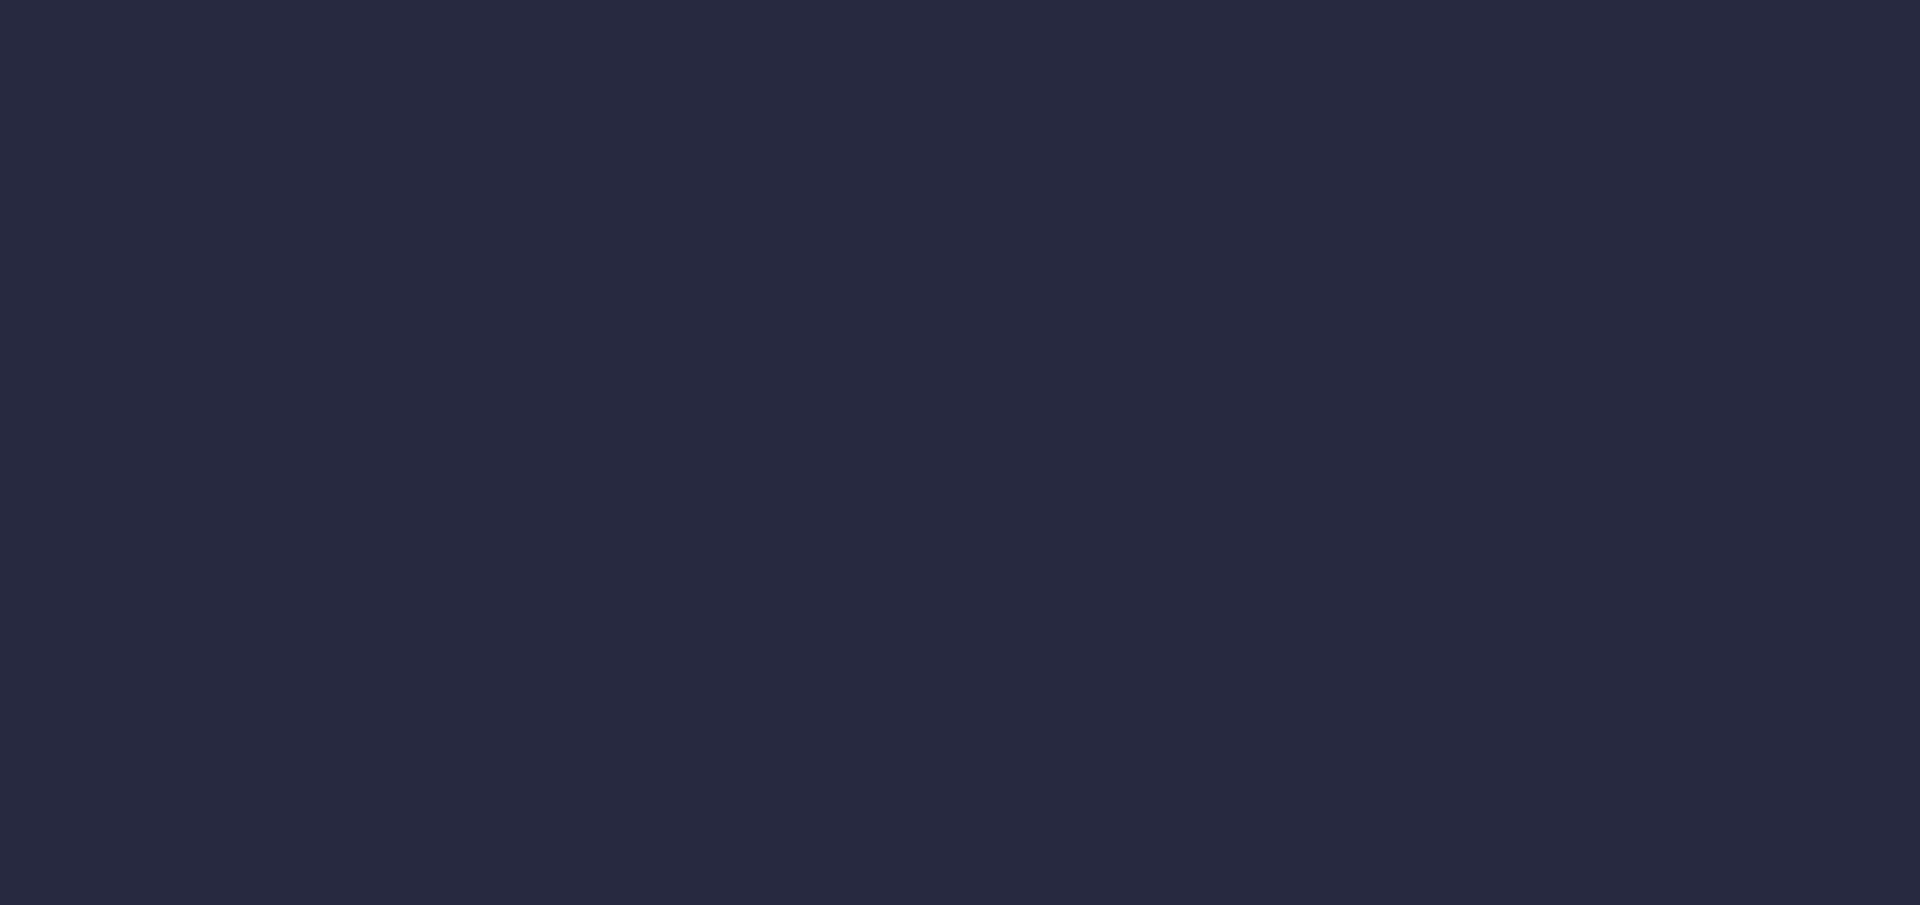 Onepage-Slide3-Color-Fill